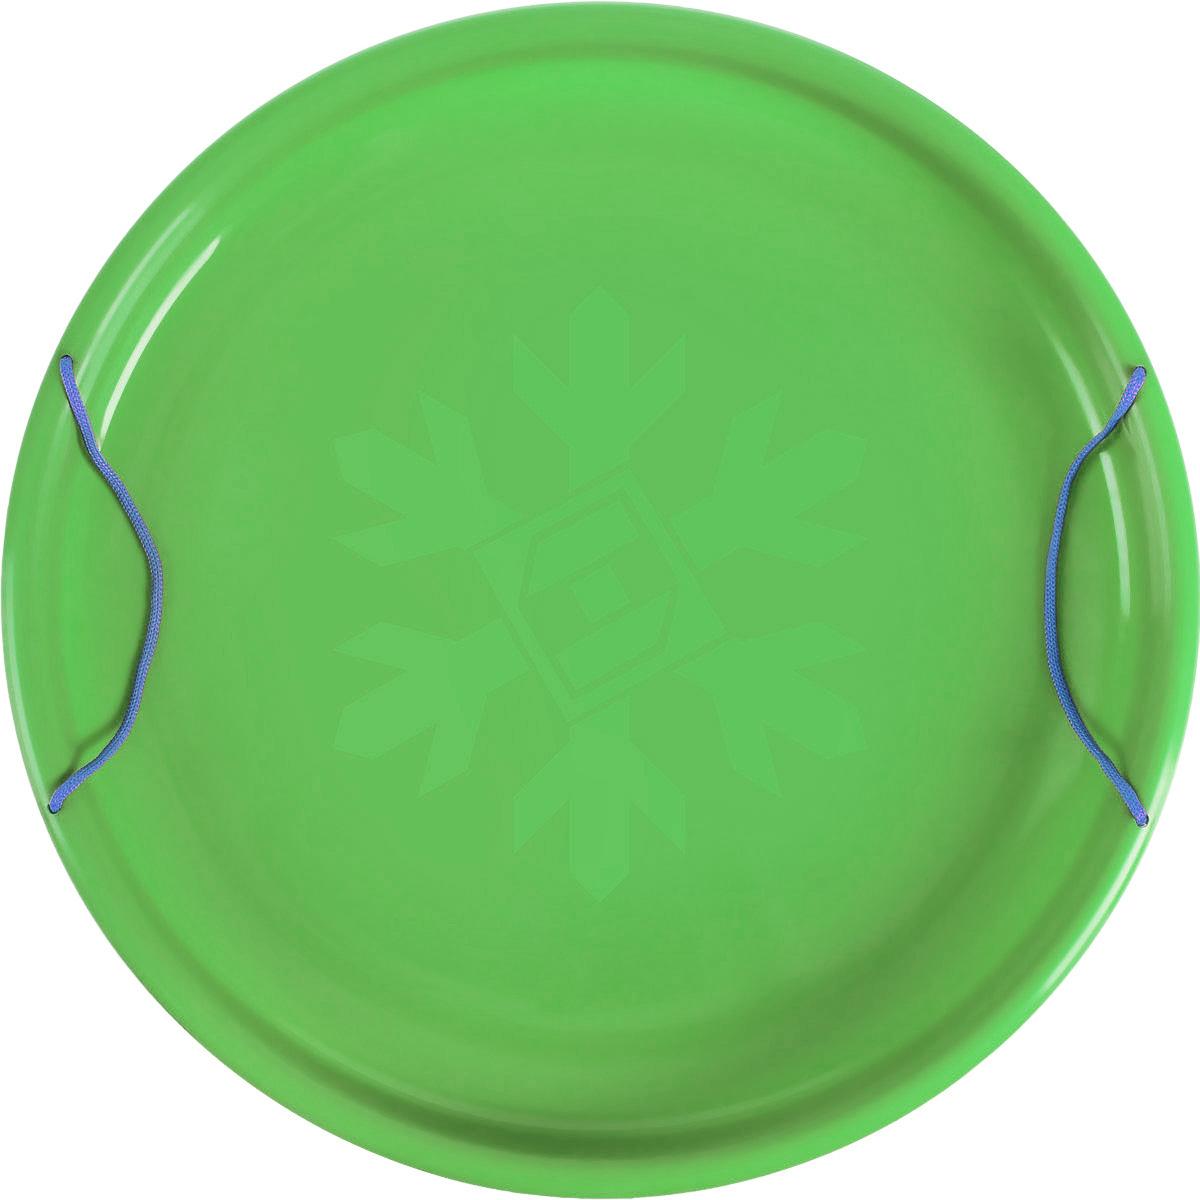 ледянки Санки-ледянки Престиж Экстрим, цвет: зеленый, диаметр 53 см